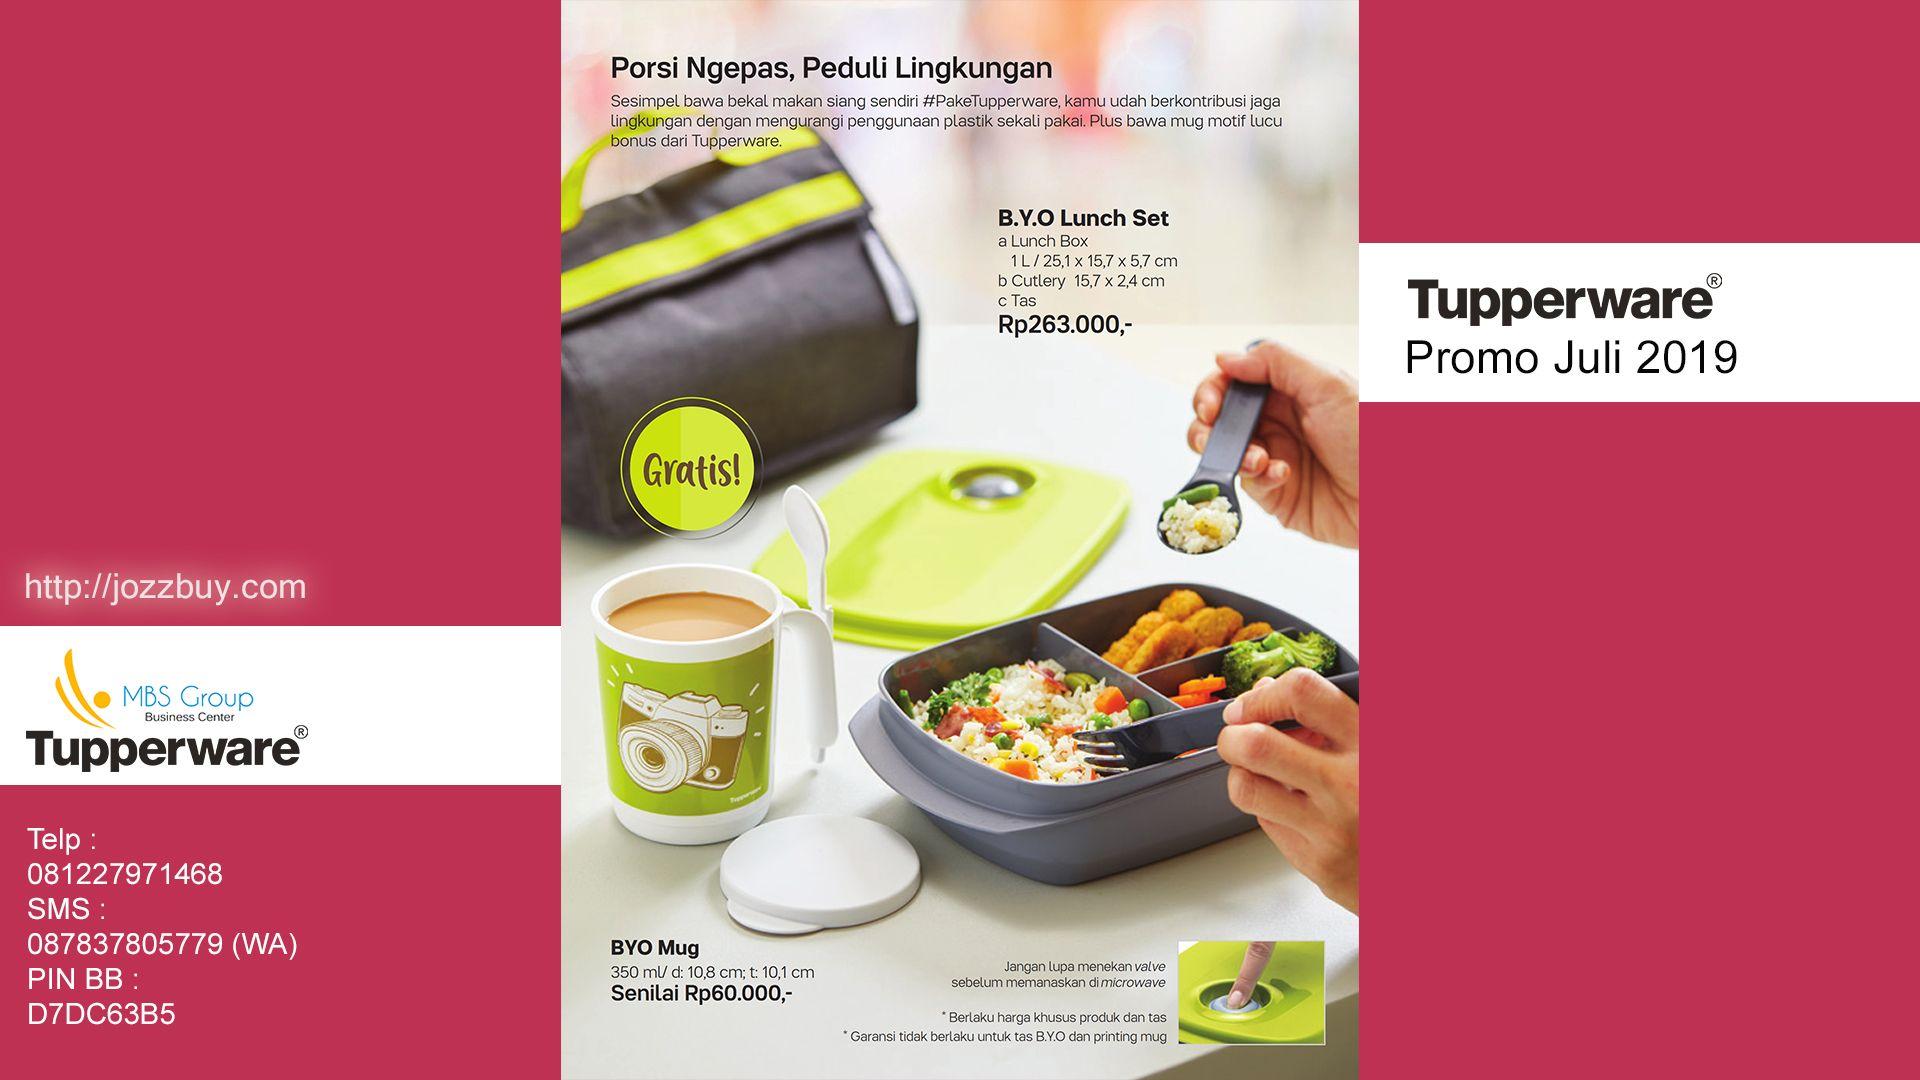 Harga Tupperware Promo Juli 2019